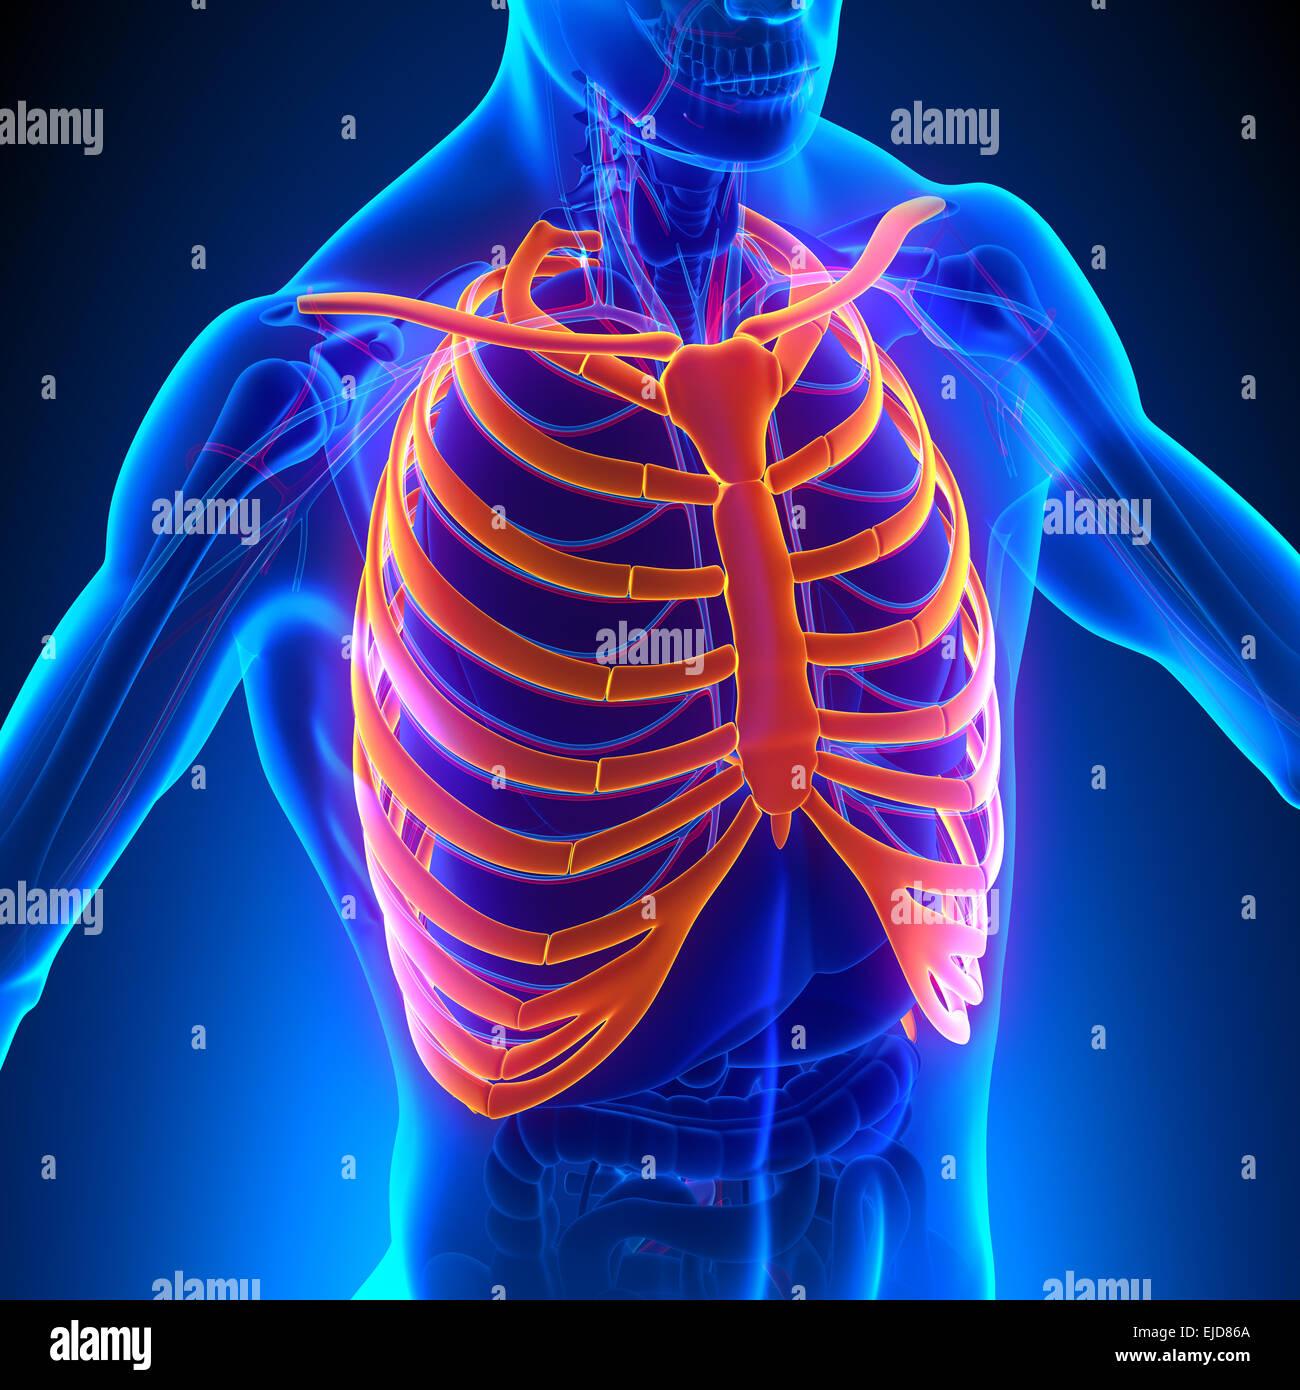 Rib Cage Anatomy Bones with Circulatory System Stock Photo: 80197106 ...